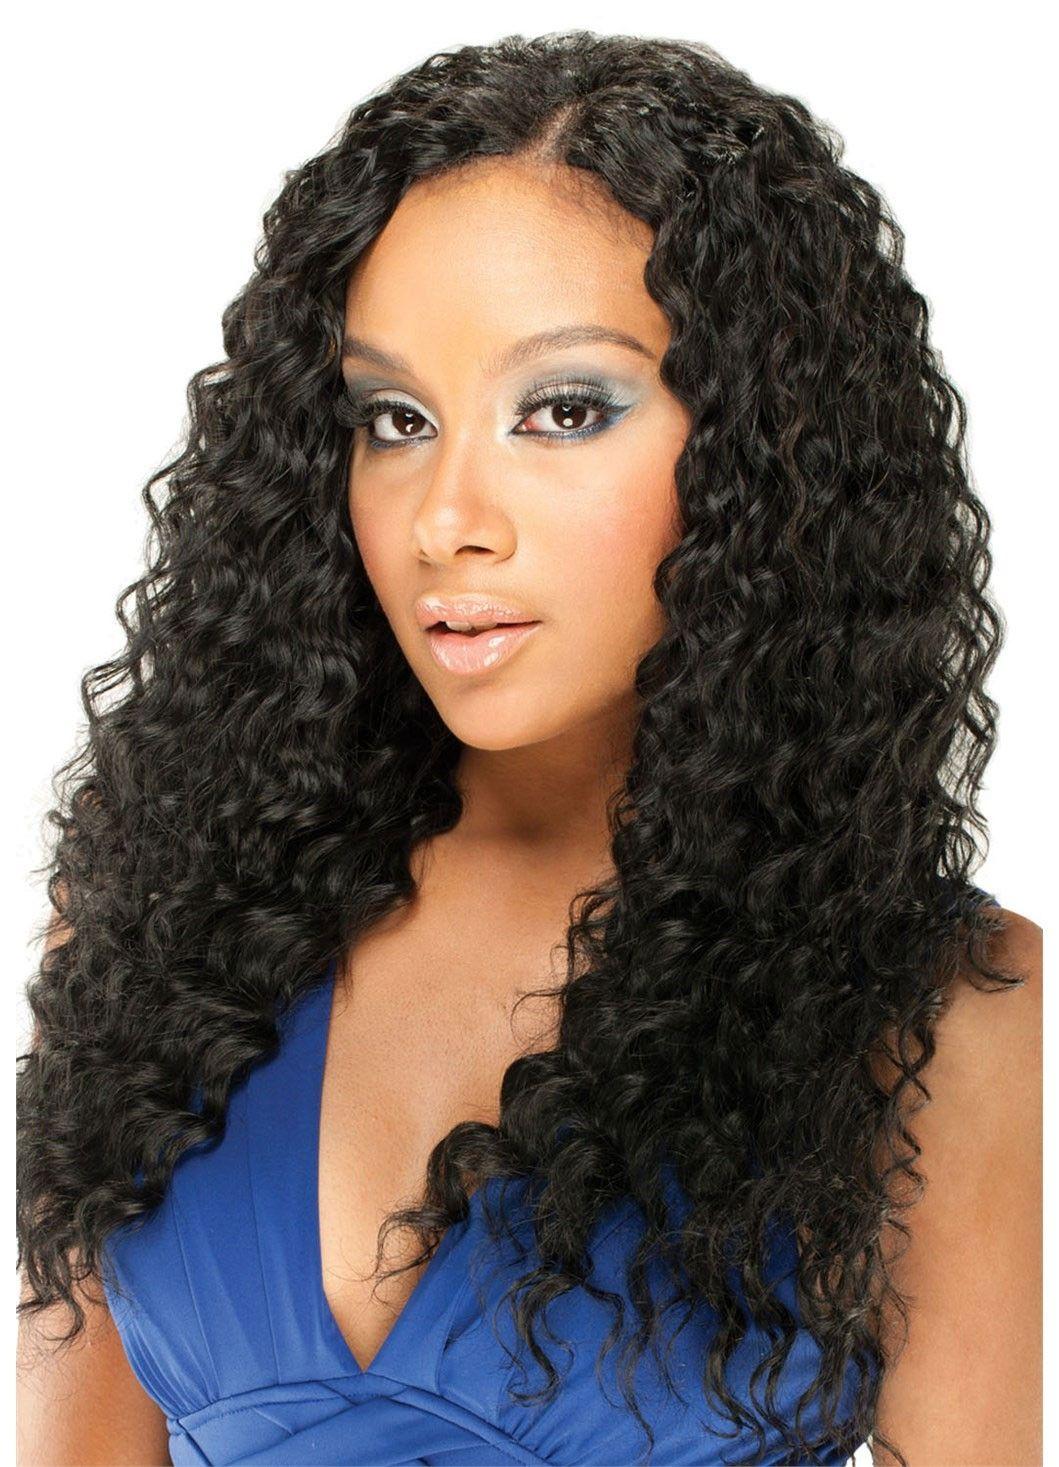 Model Model Remist 100 Indian Remy Human Hair Weave LONG